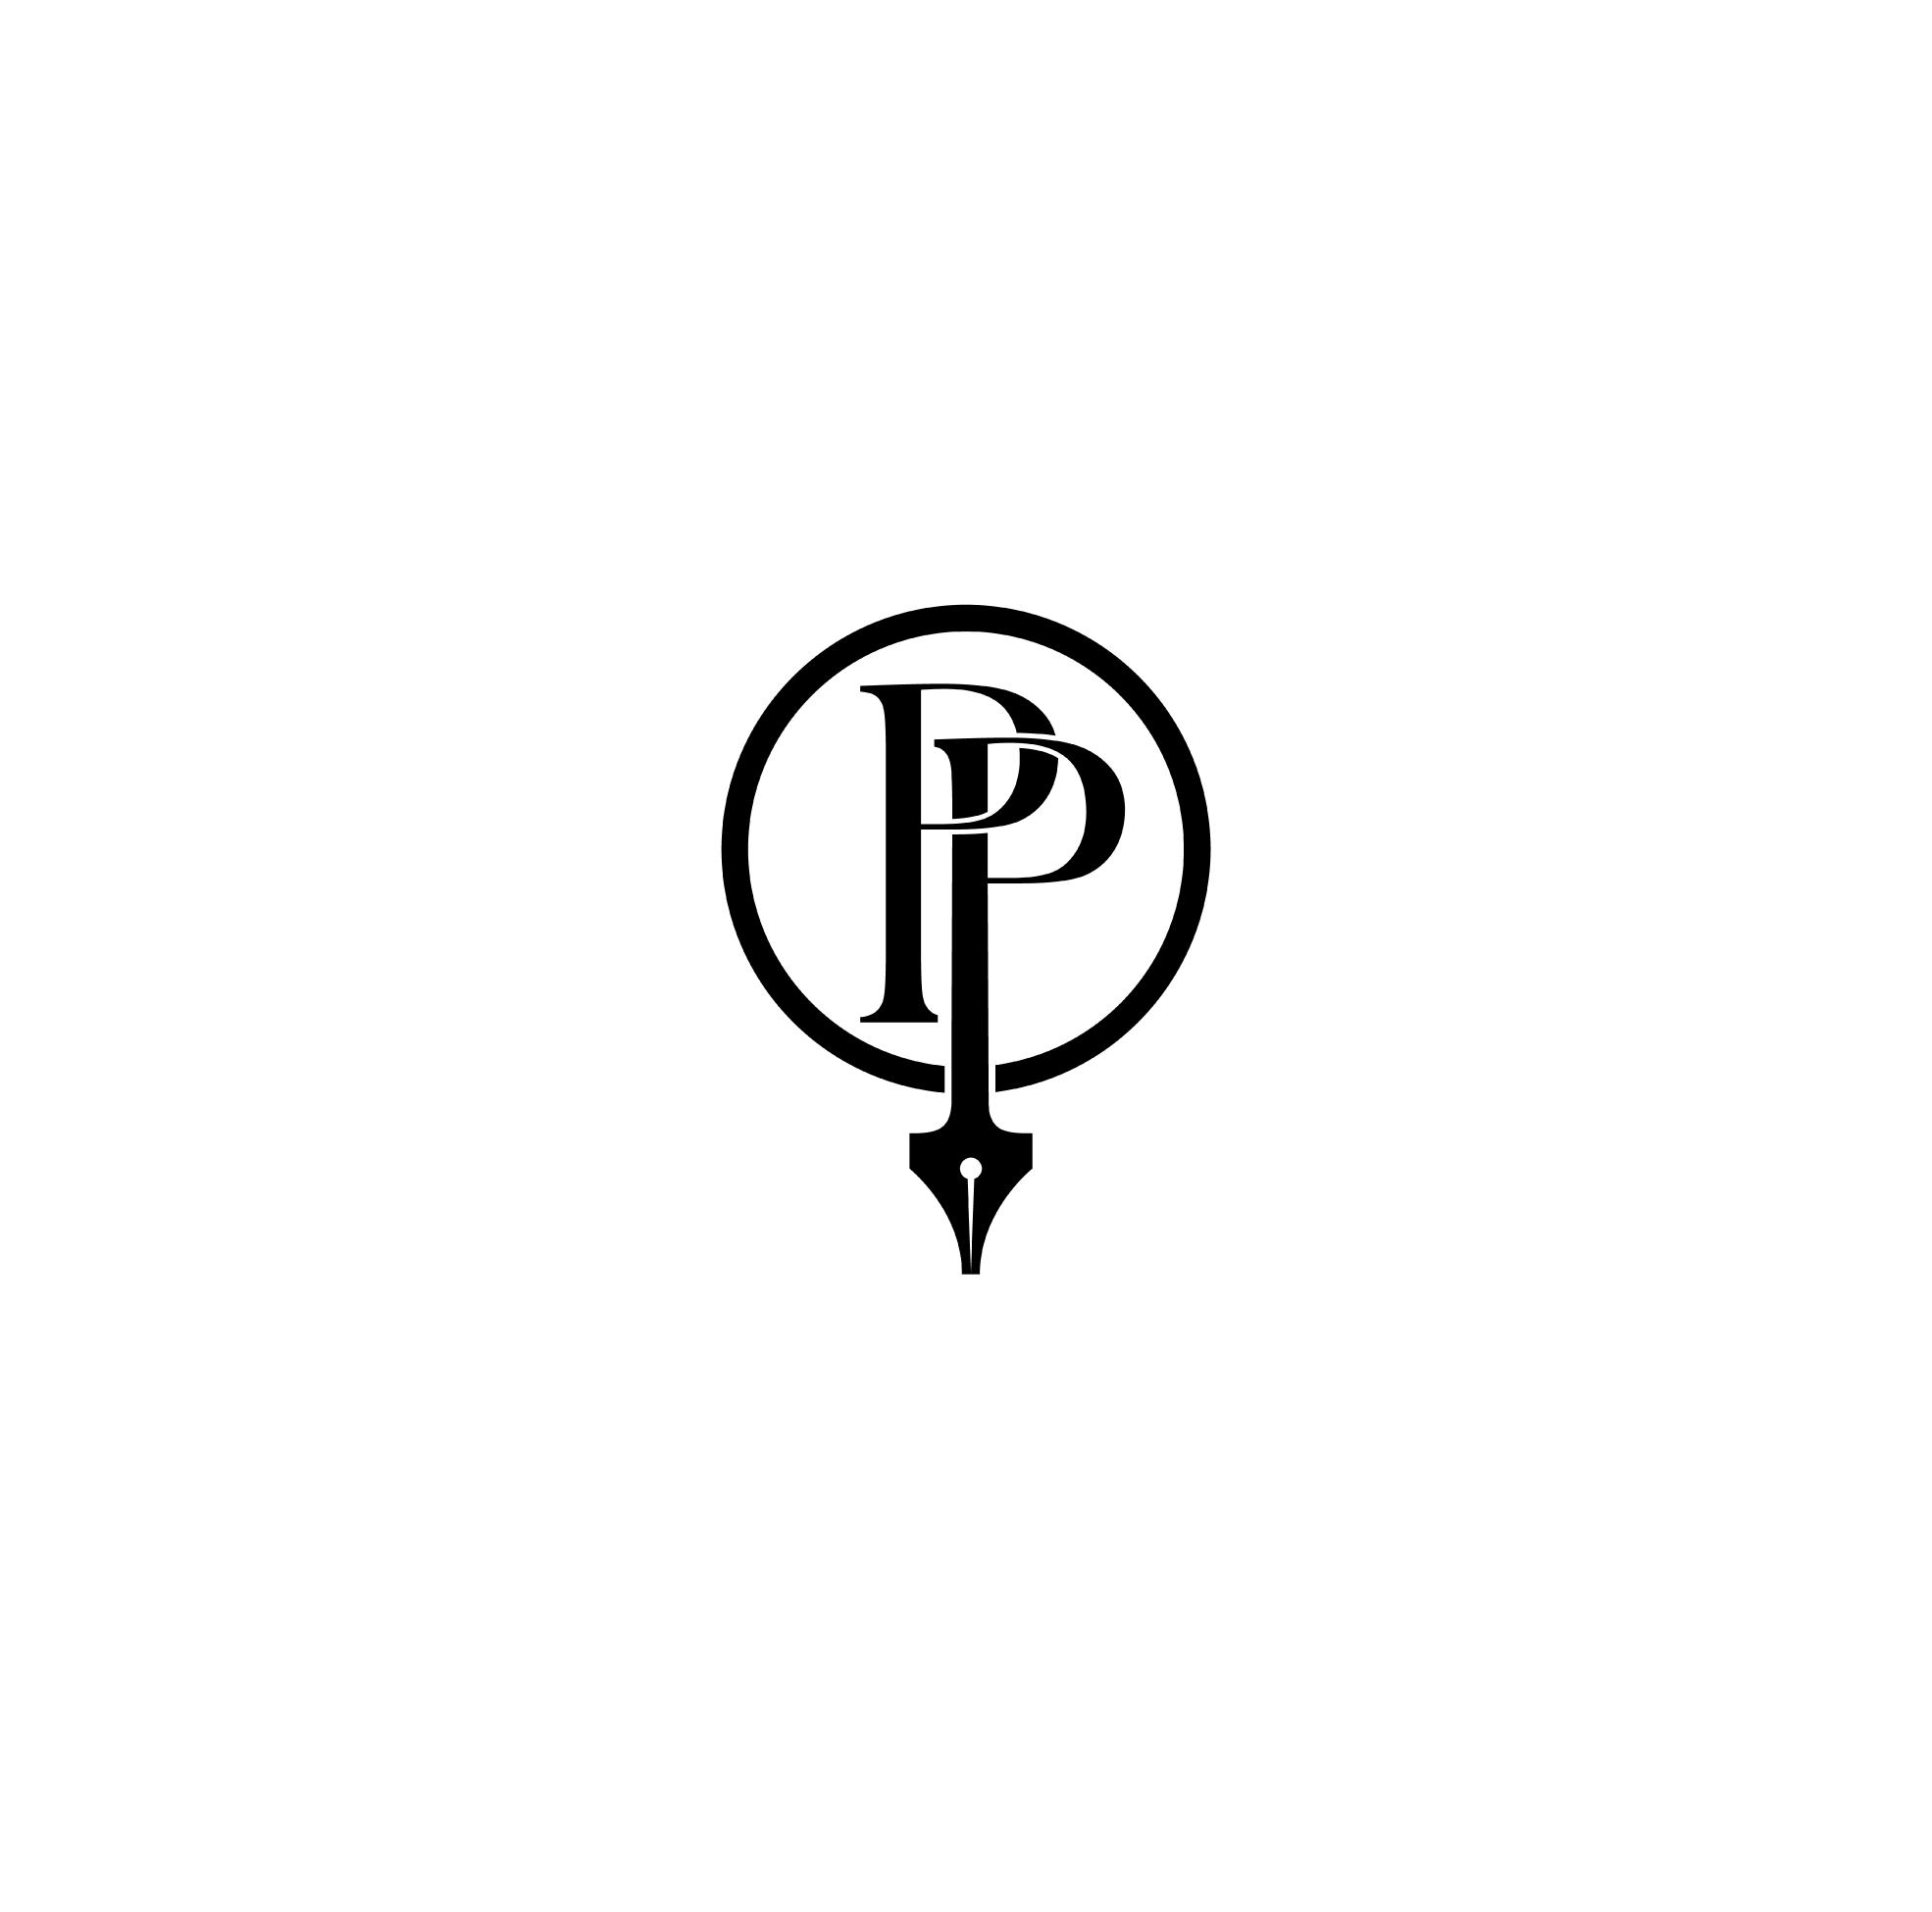 Preda-Popescu monogram